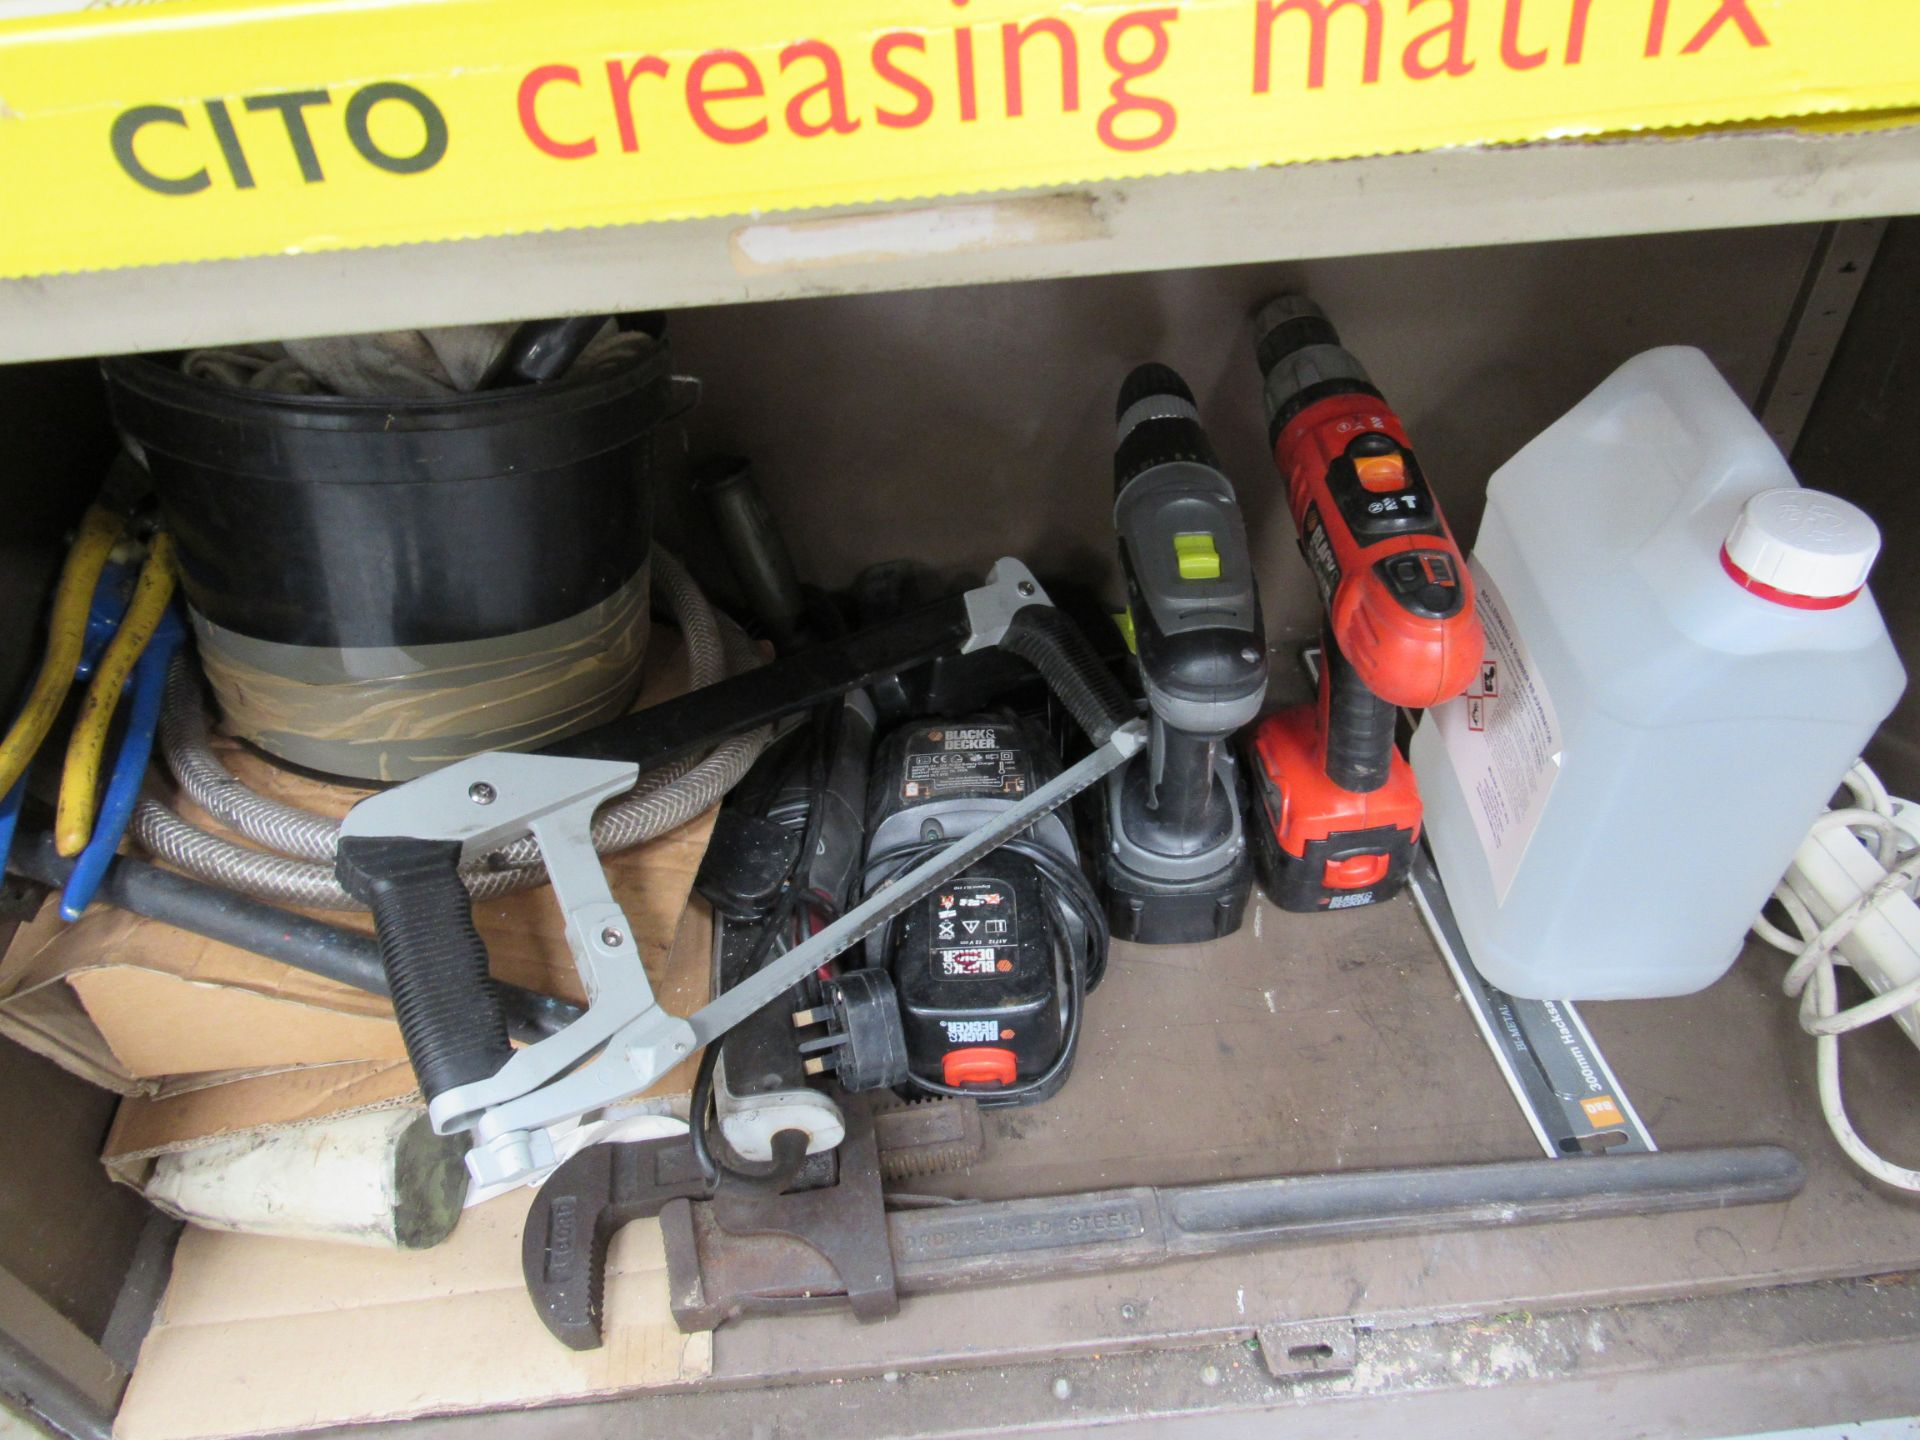 Steel Double Door Cupboard and Contents Creasing Matrix and Various Tools - Image 4 of 4